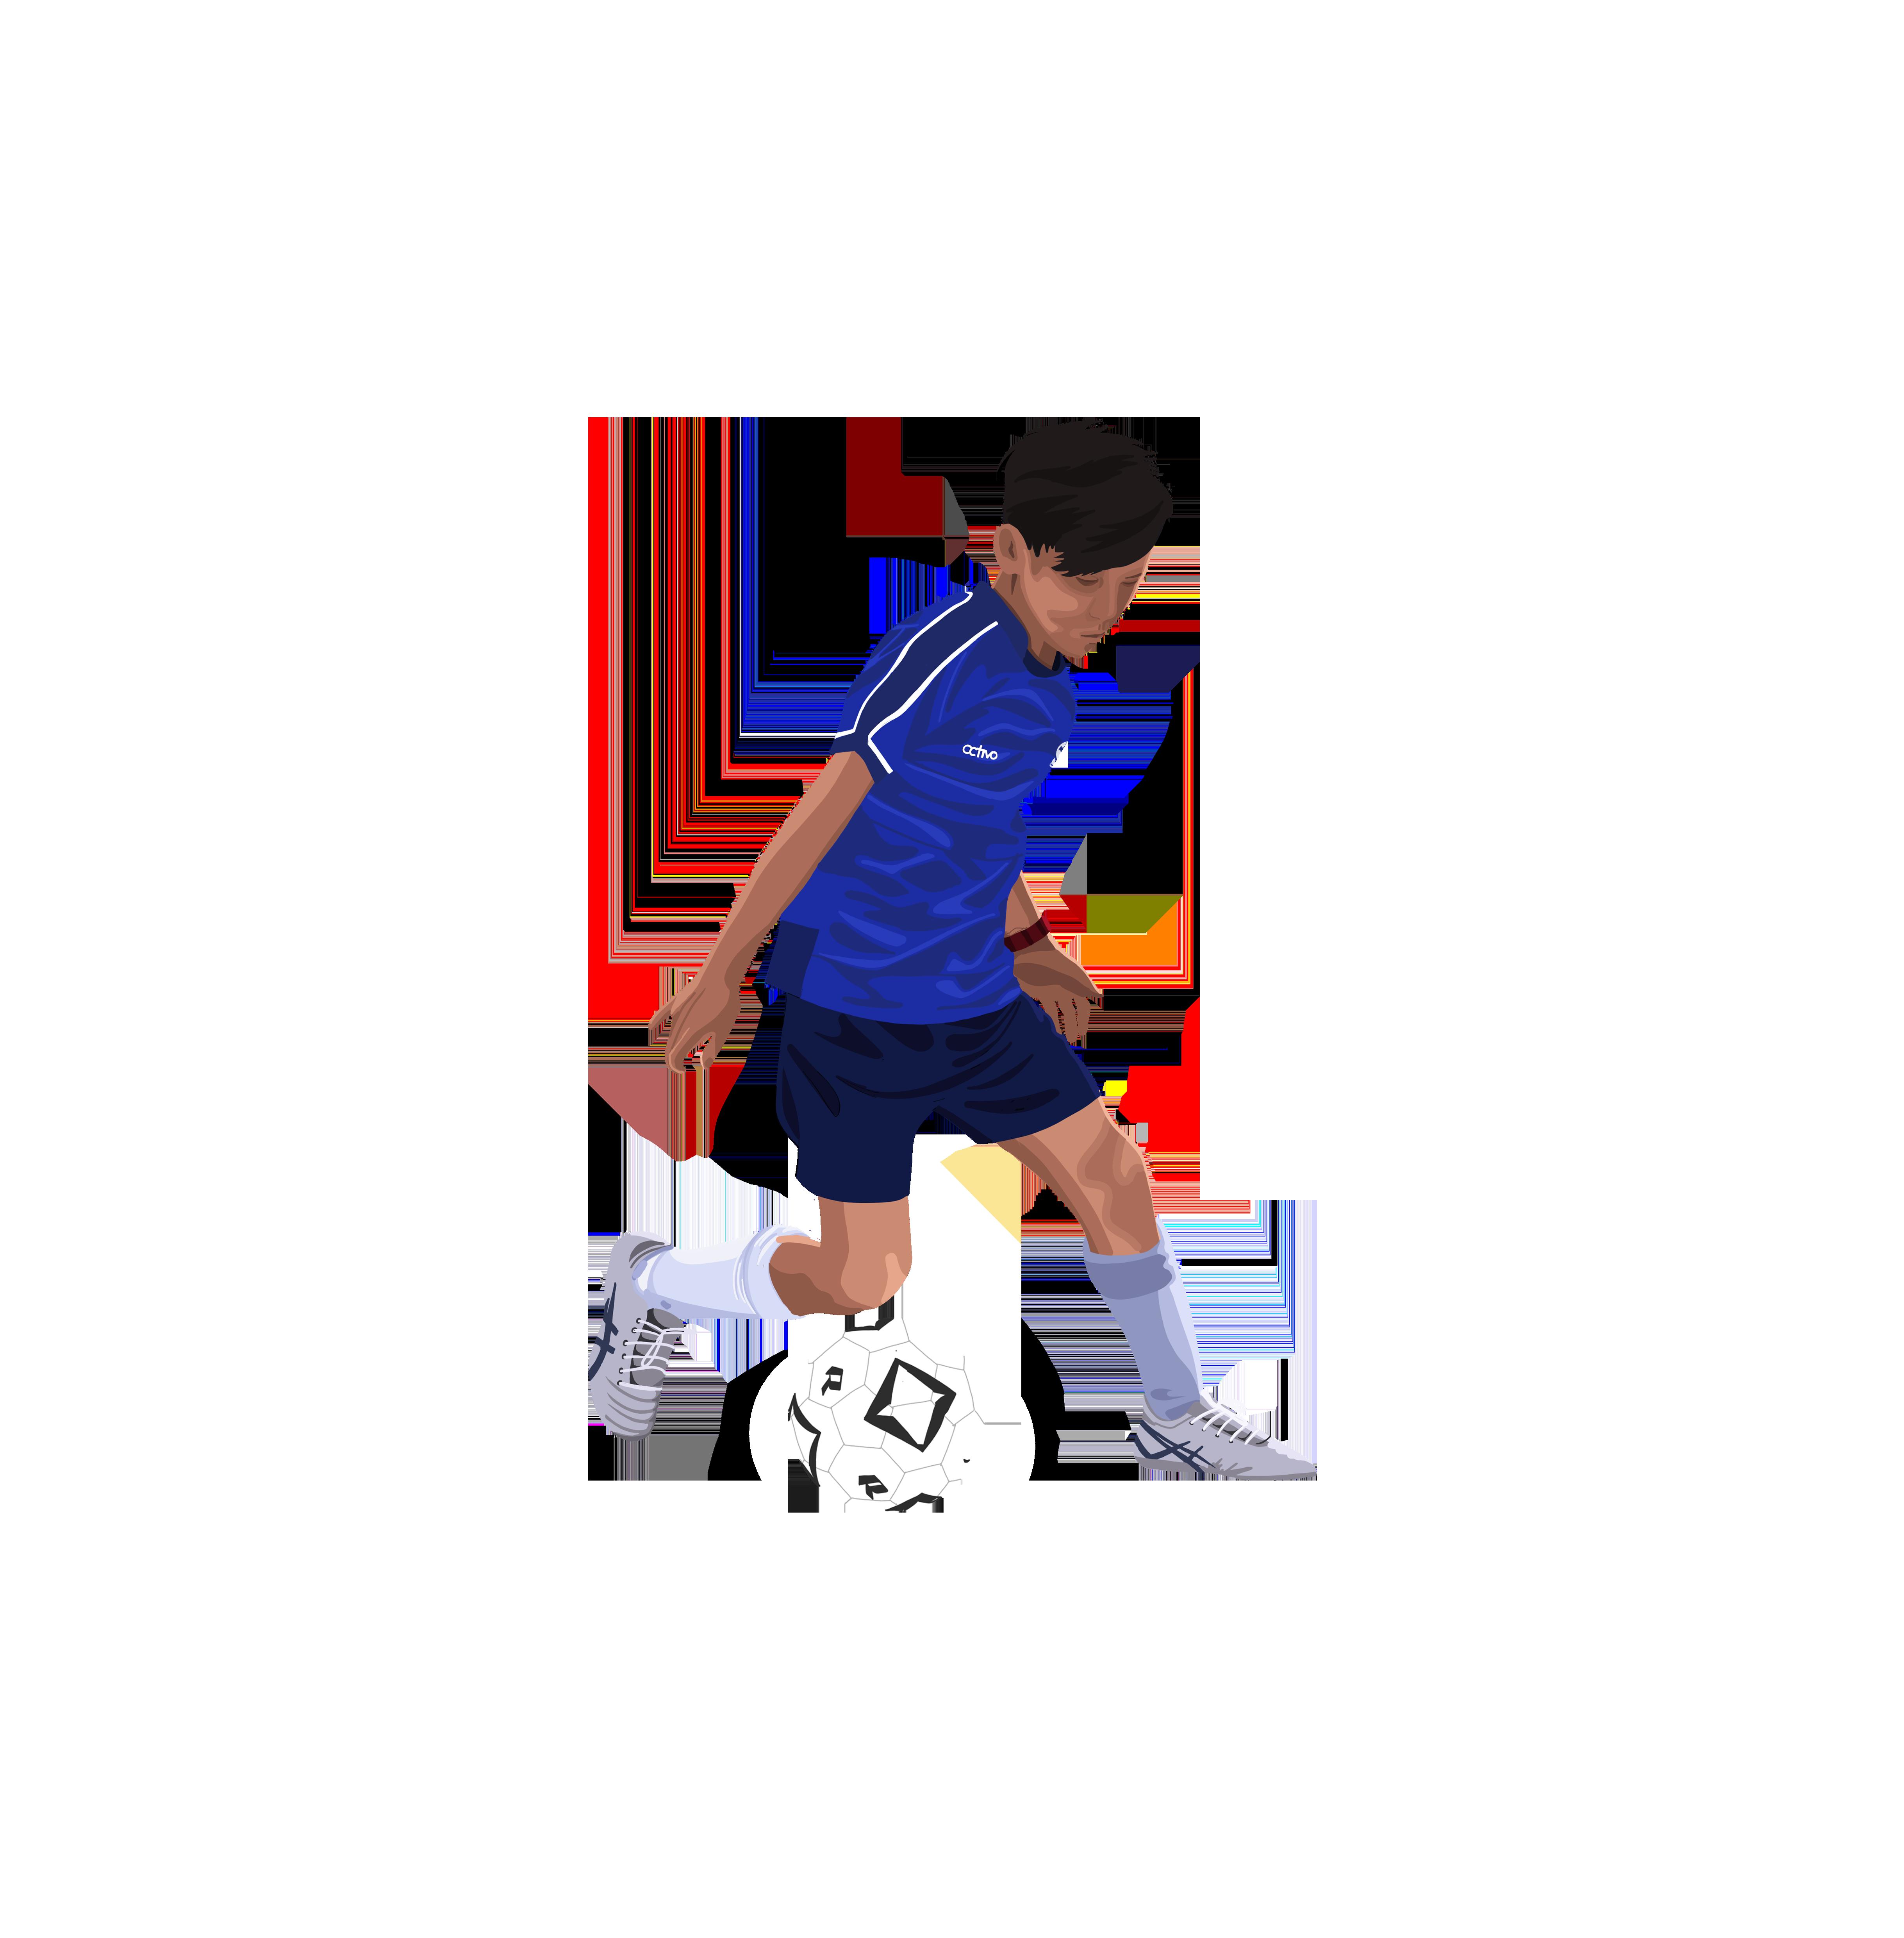 https://justfootballacademy.com.au/wp-content/uploads/2021/02/Owen-no-bg.png